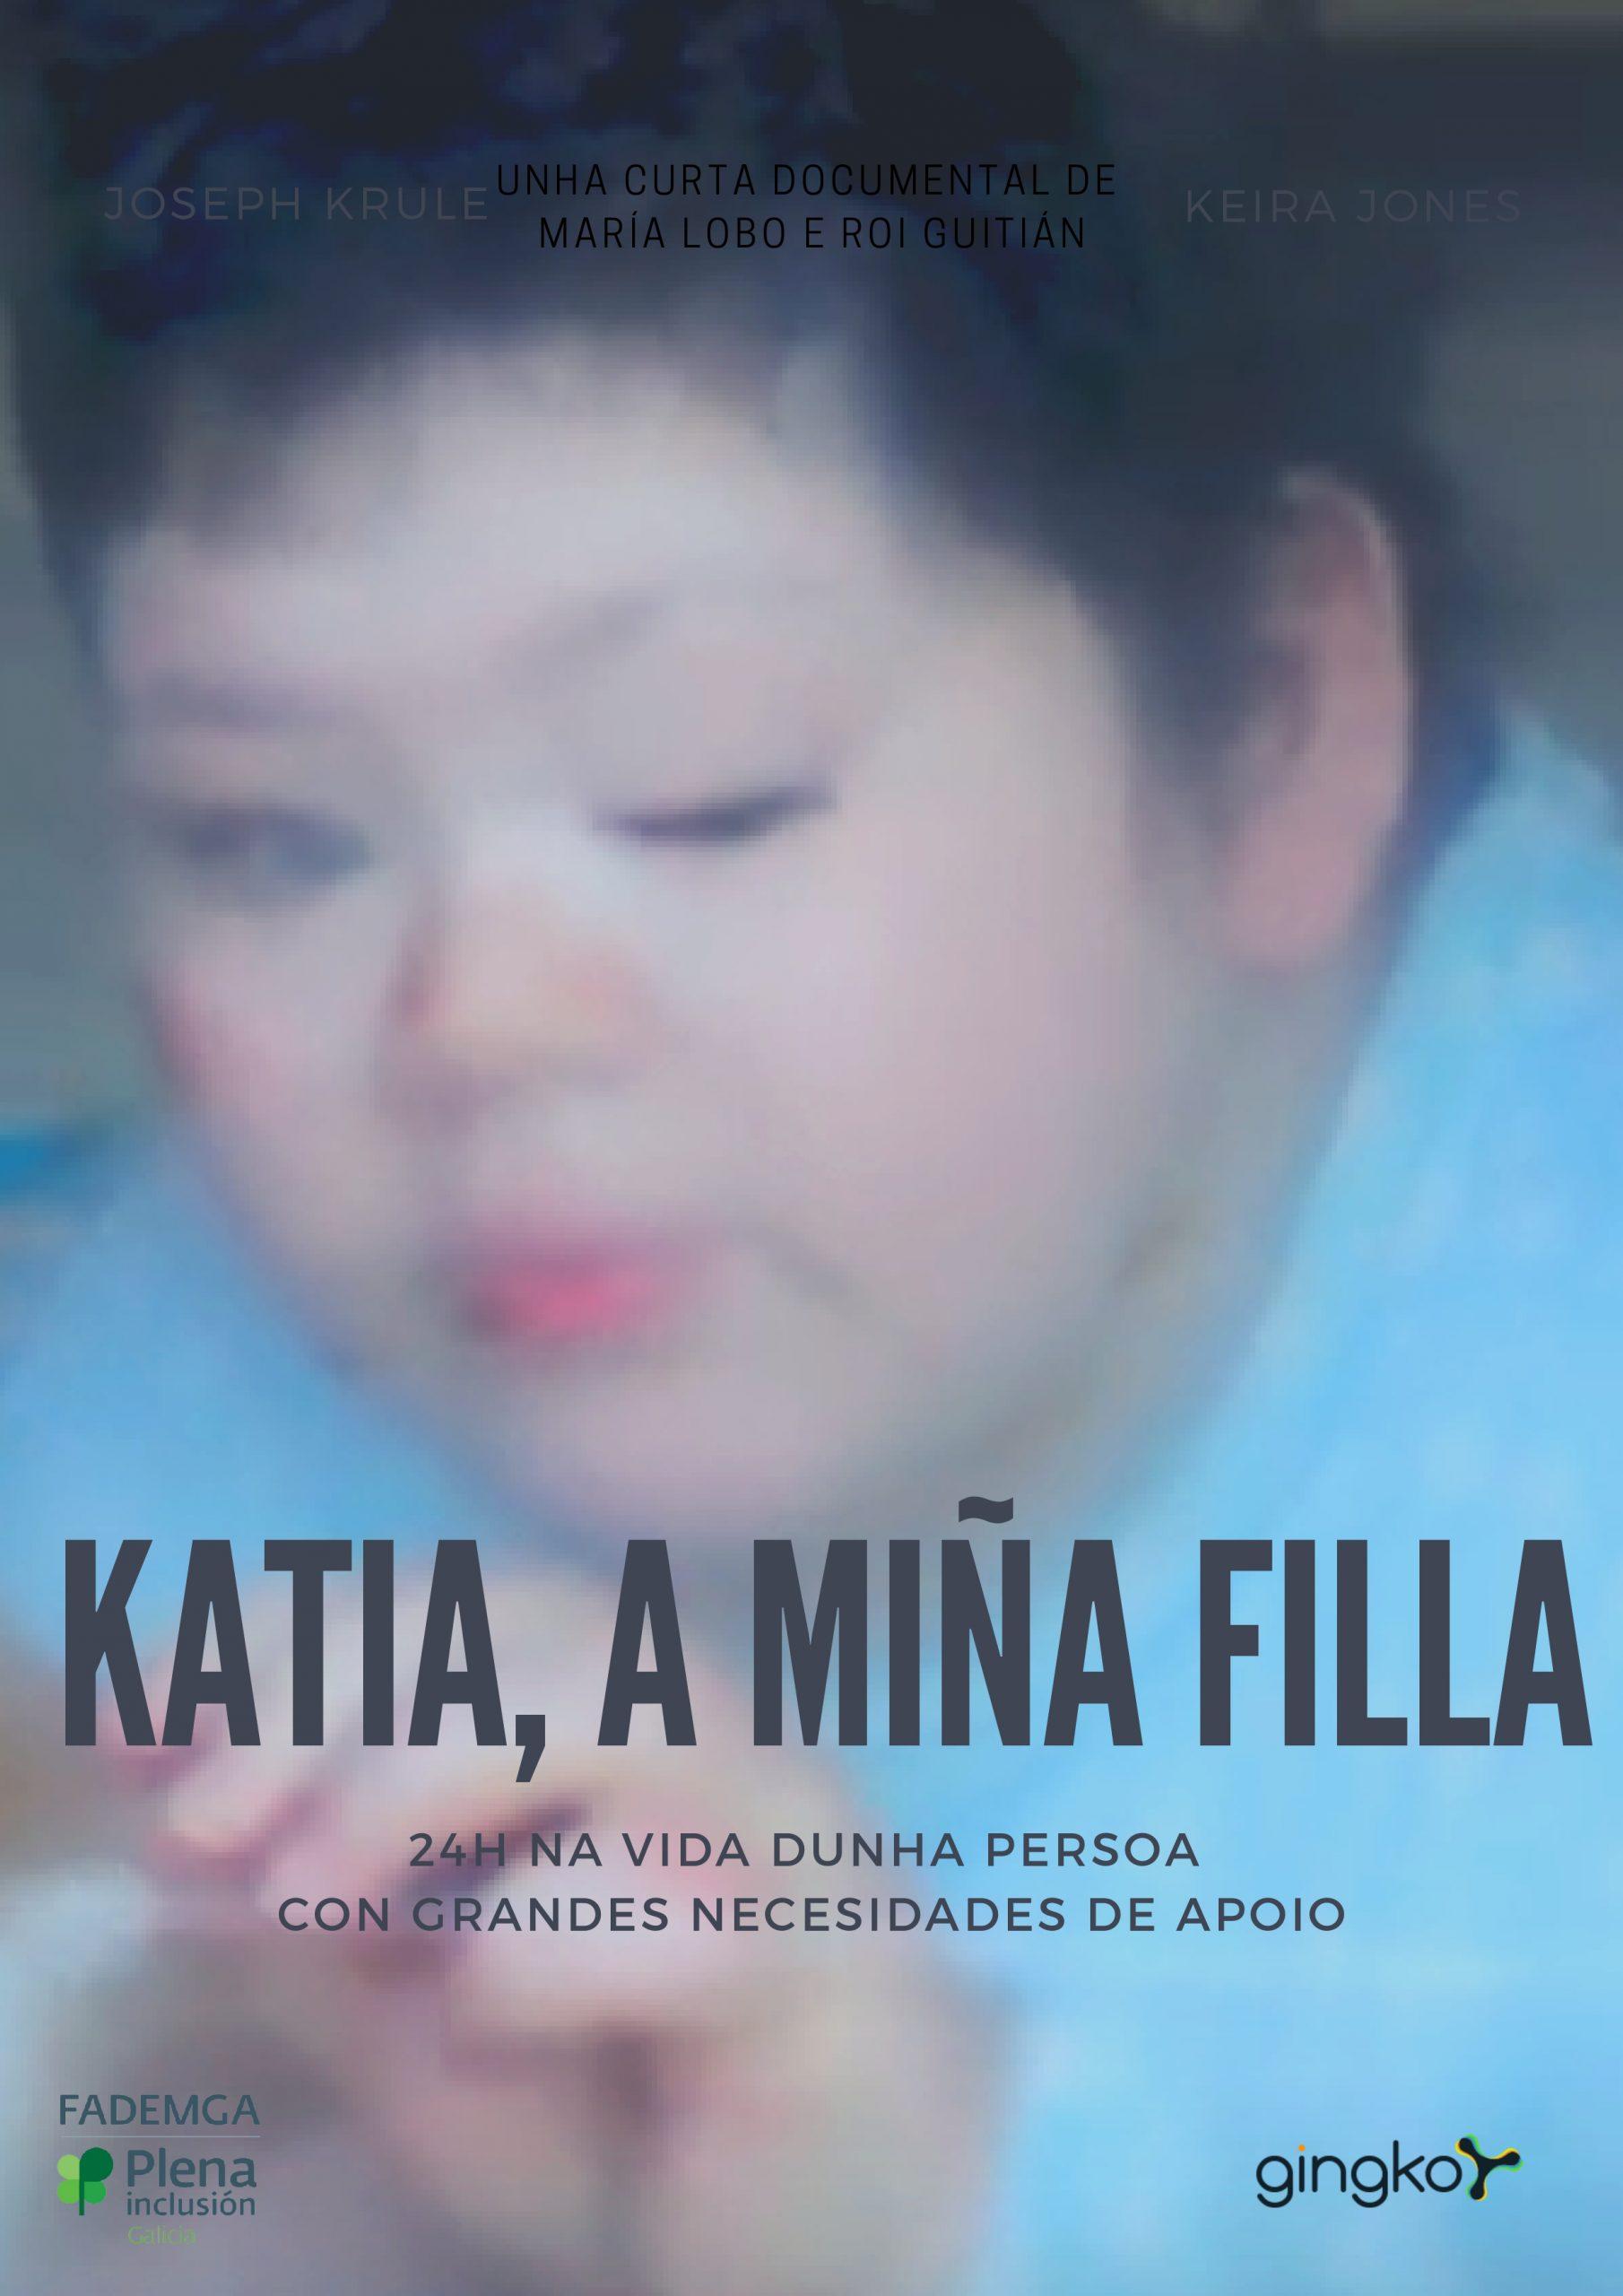 Katia, a miña filla_Poster_page-0001